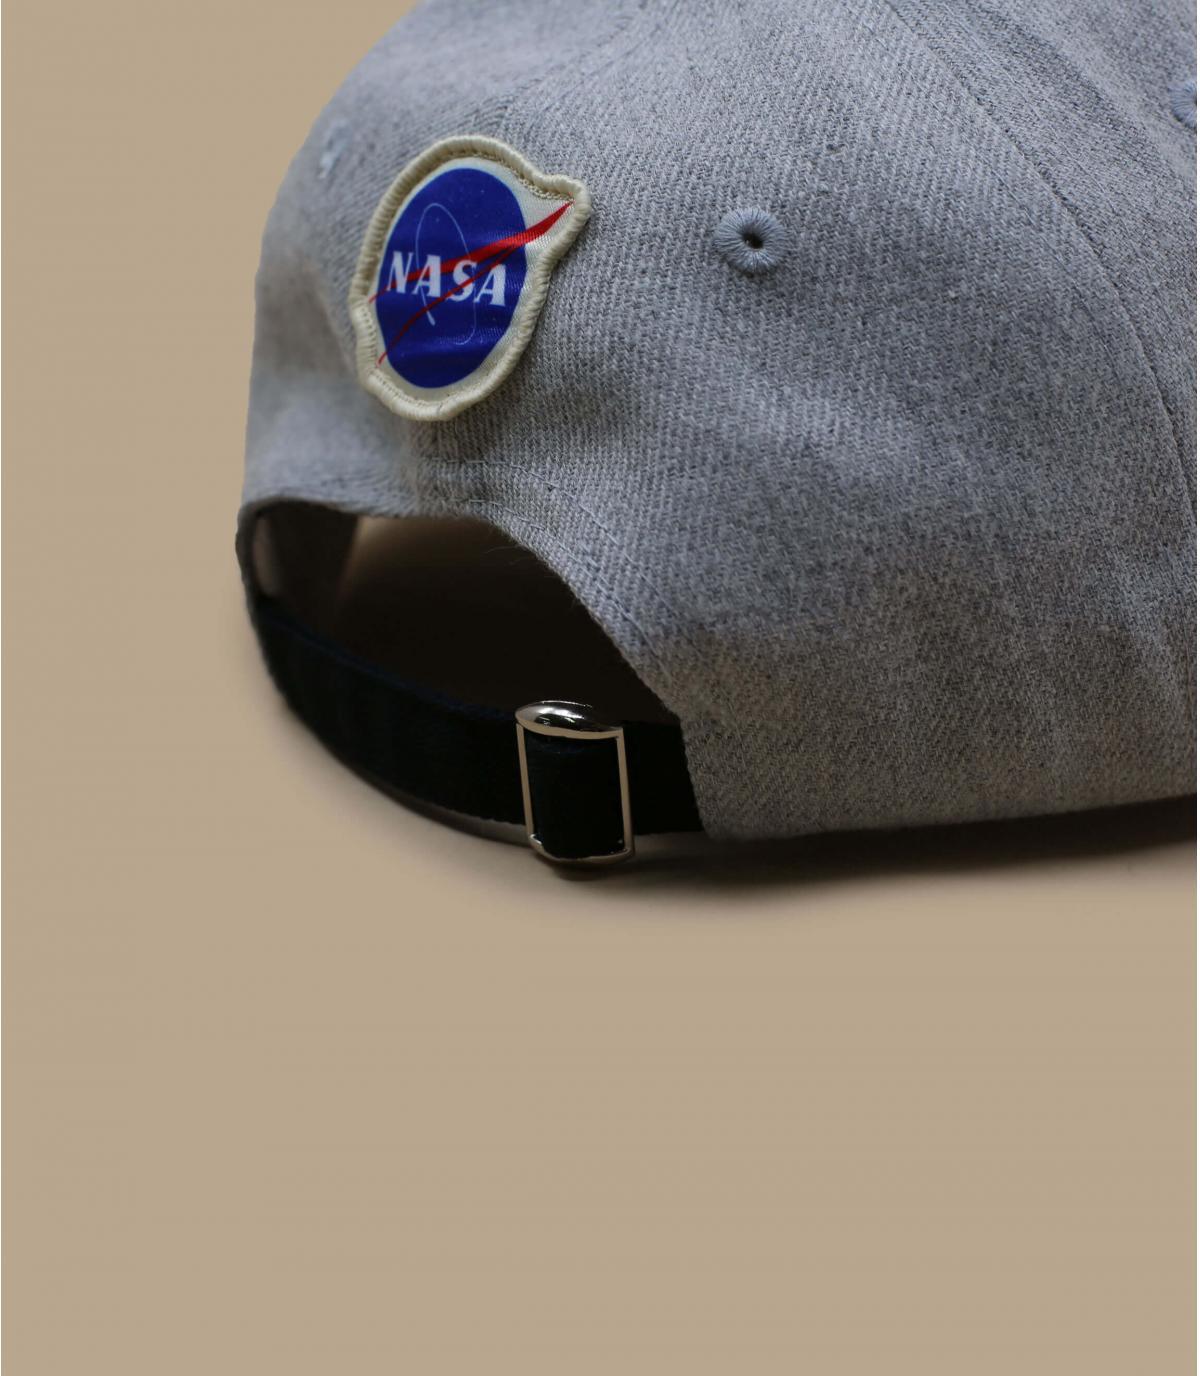 Details Curve Nasa Logo and Patches - Abbildung 3